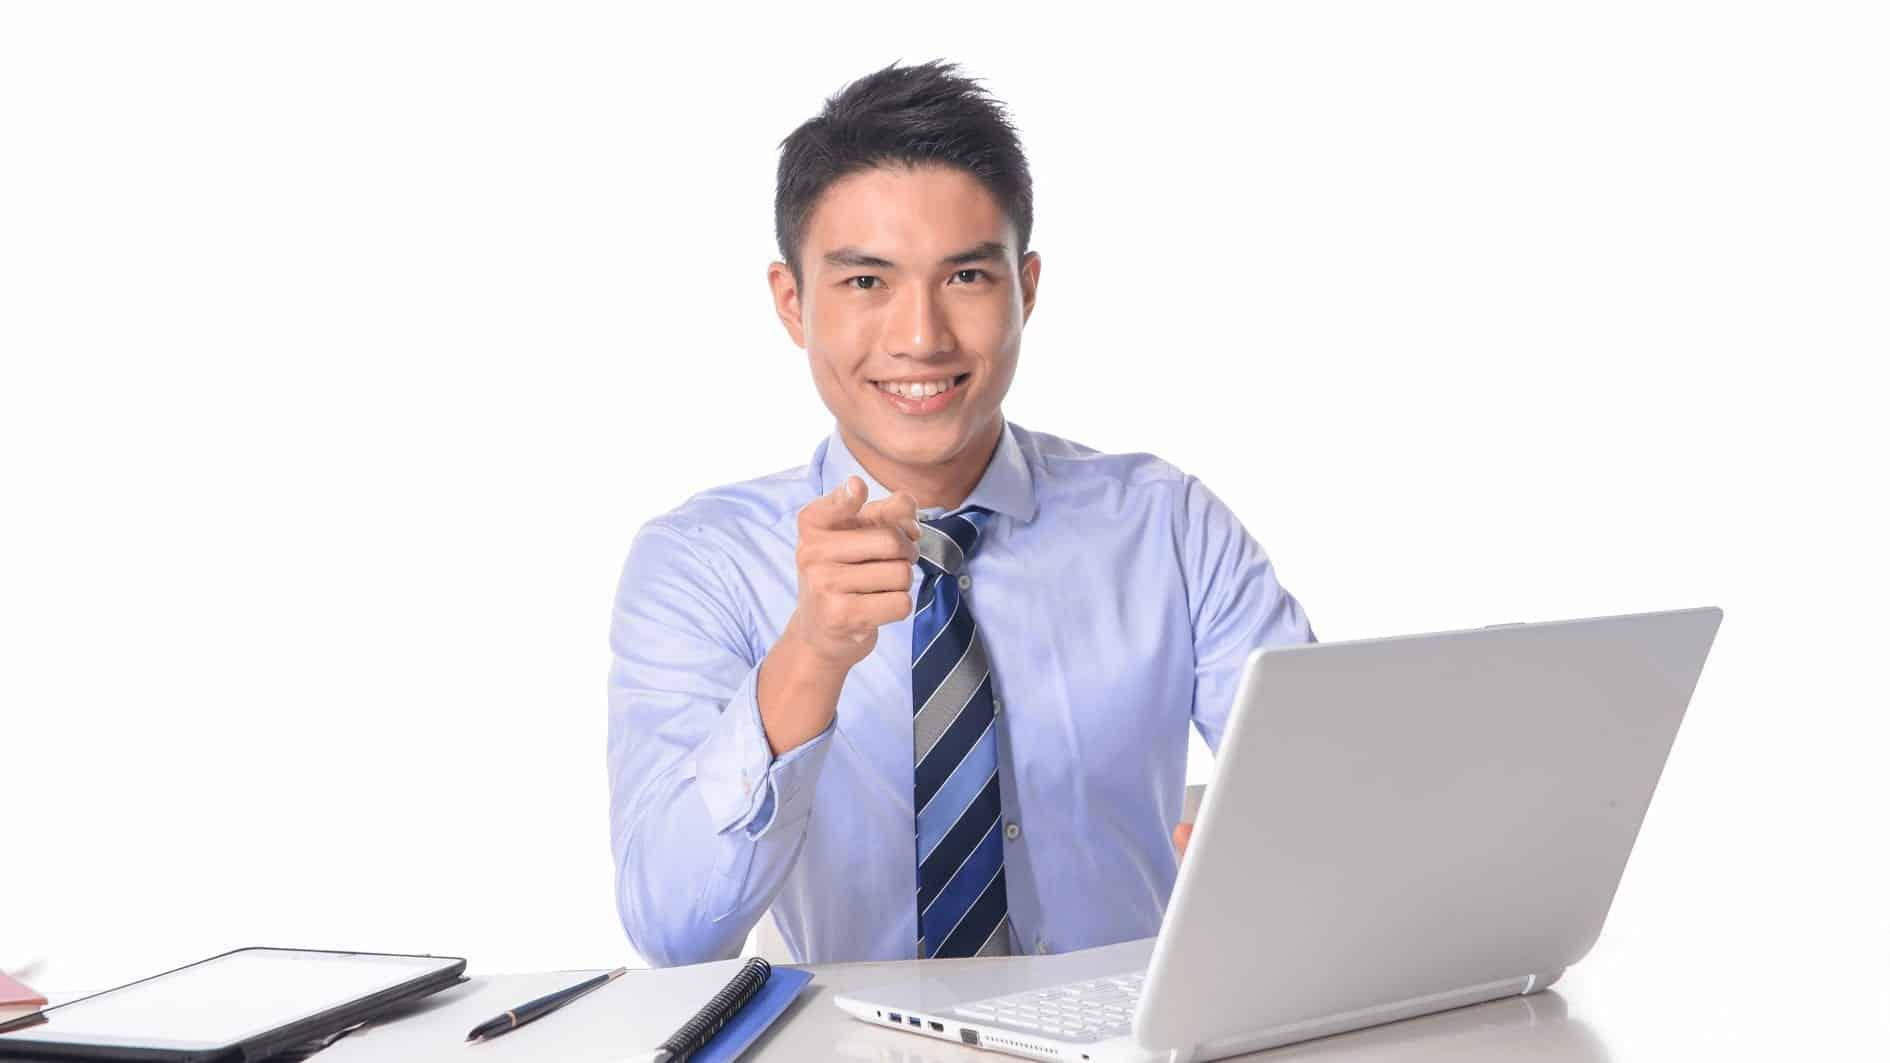 itur Unggulan Software HRIS dan Manfaatnya bagi Perusahaan Apa Saja?